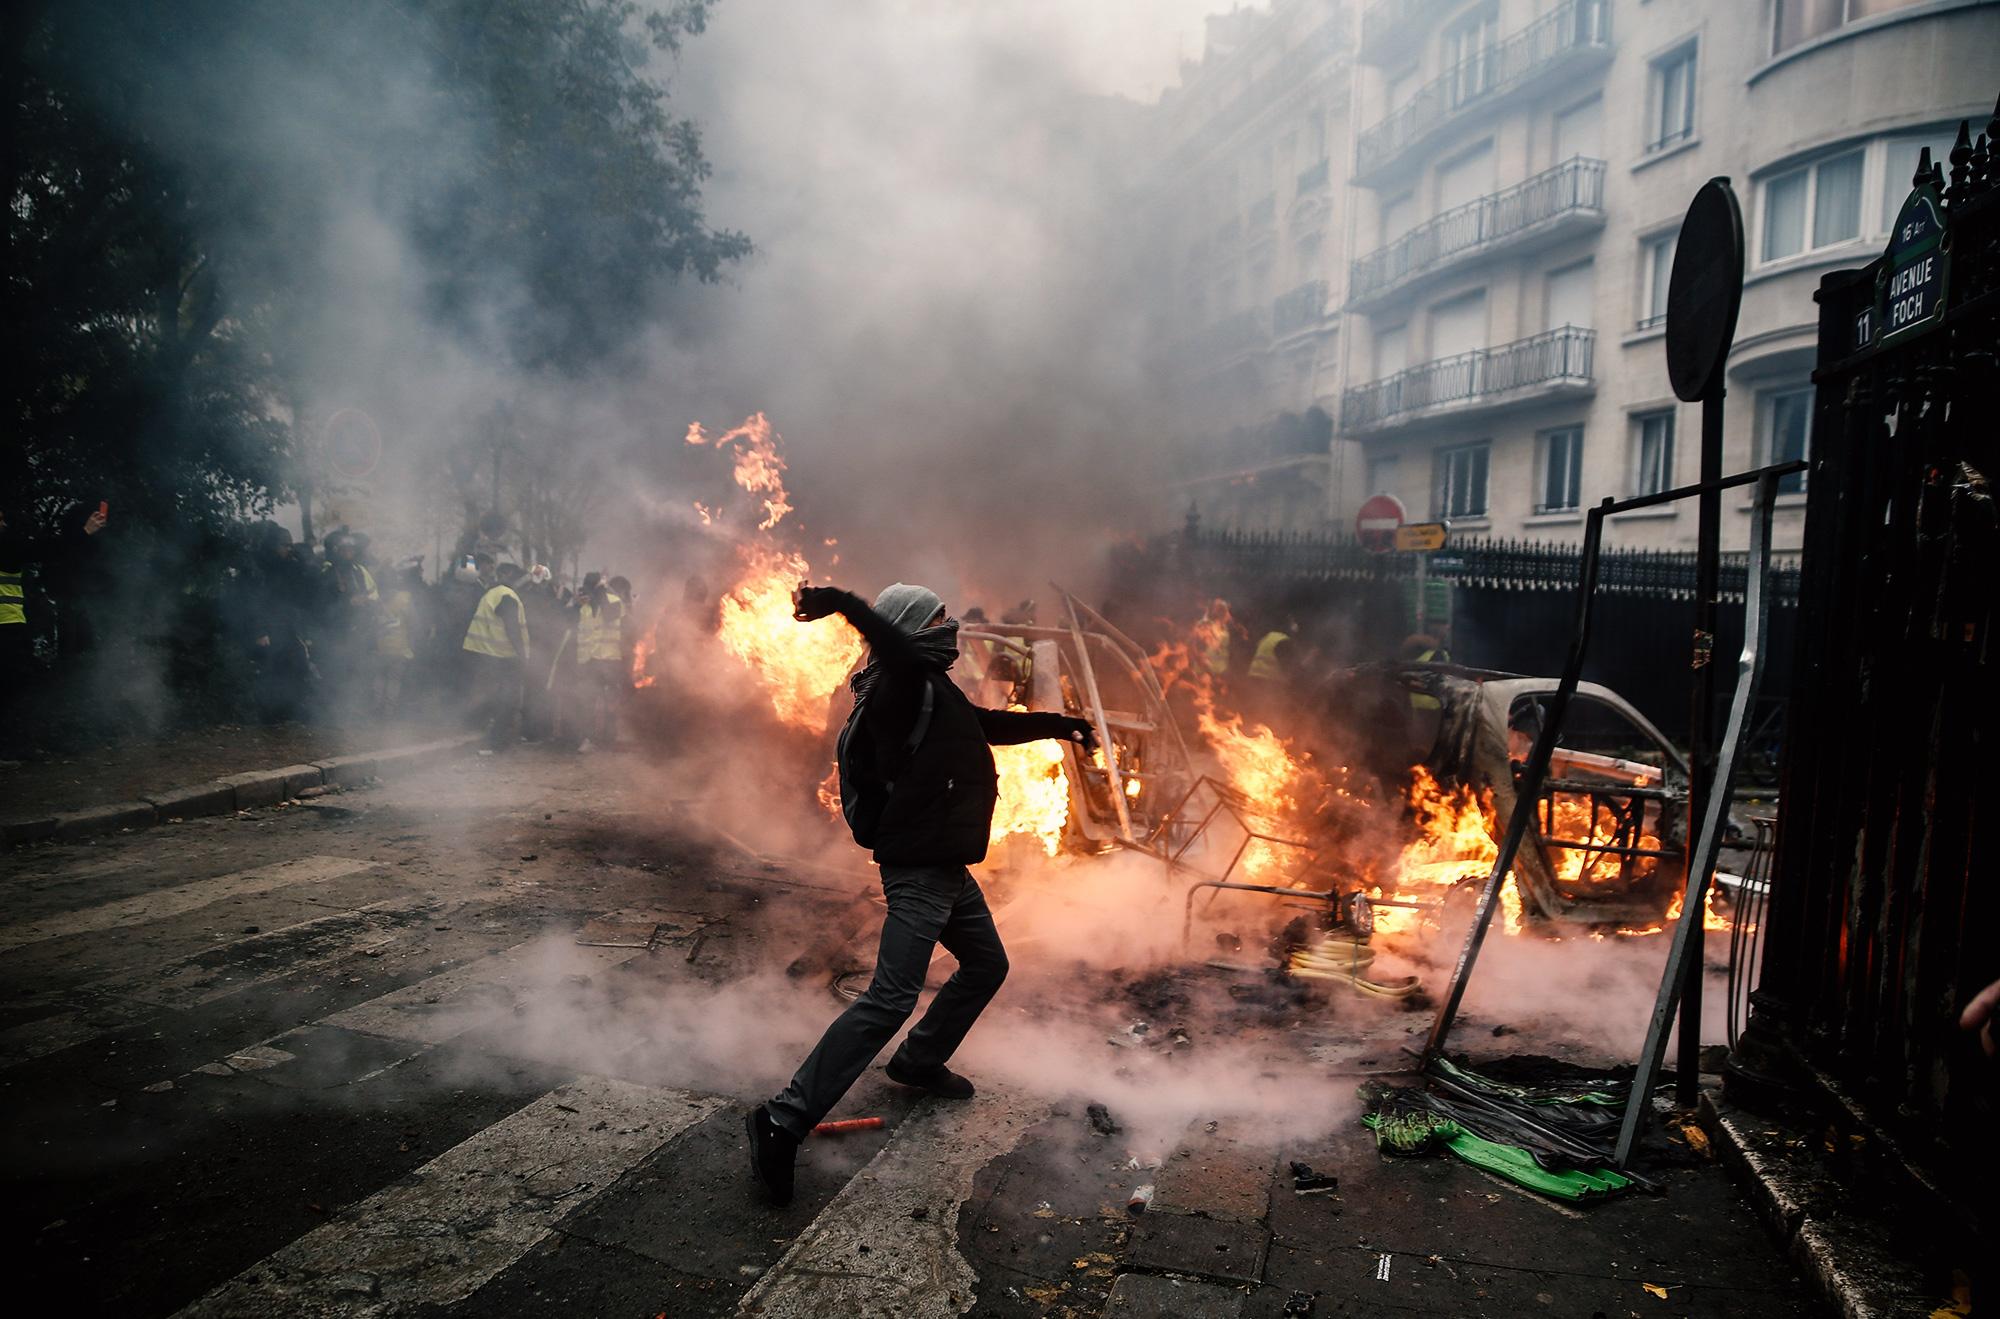 Протестующий бросает снаряд всиловиков